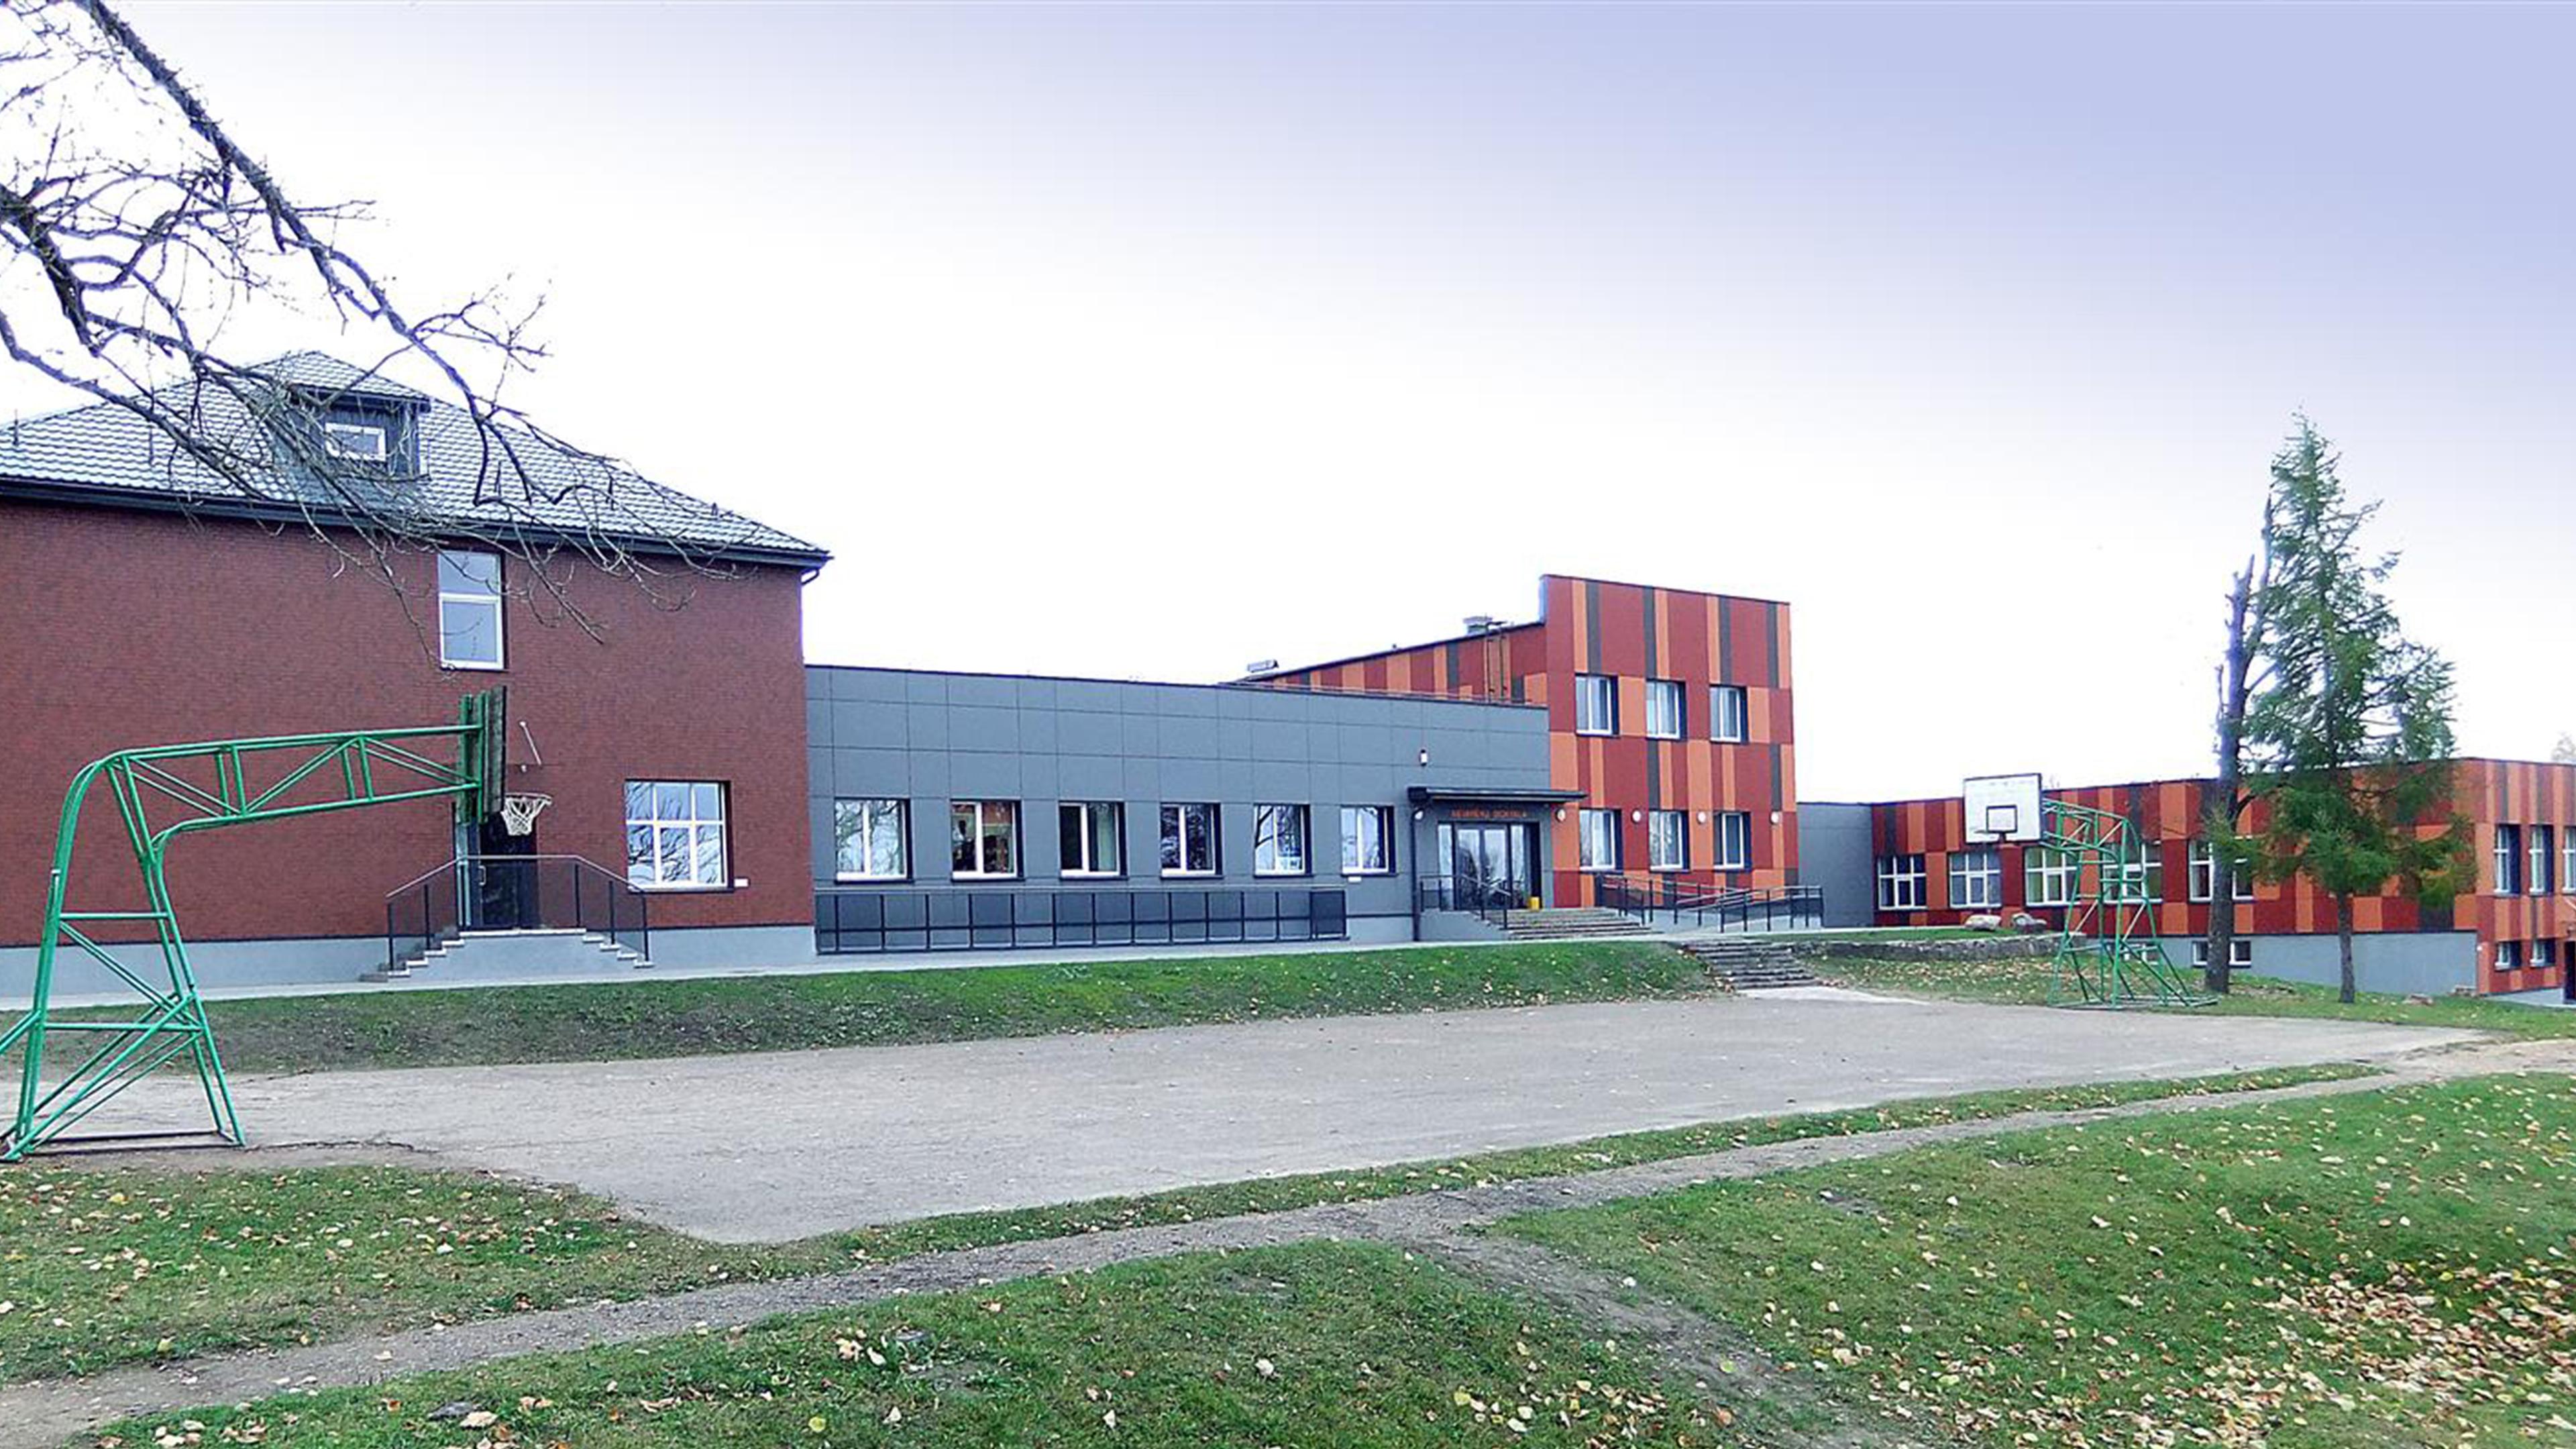 Nevarenu-Primary-School-In-Lithuania-1.jpg